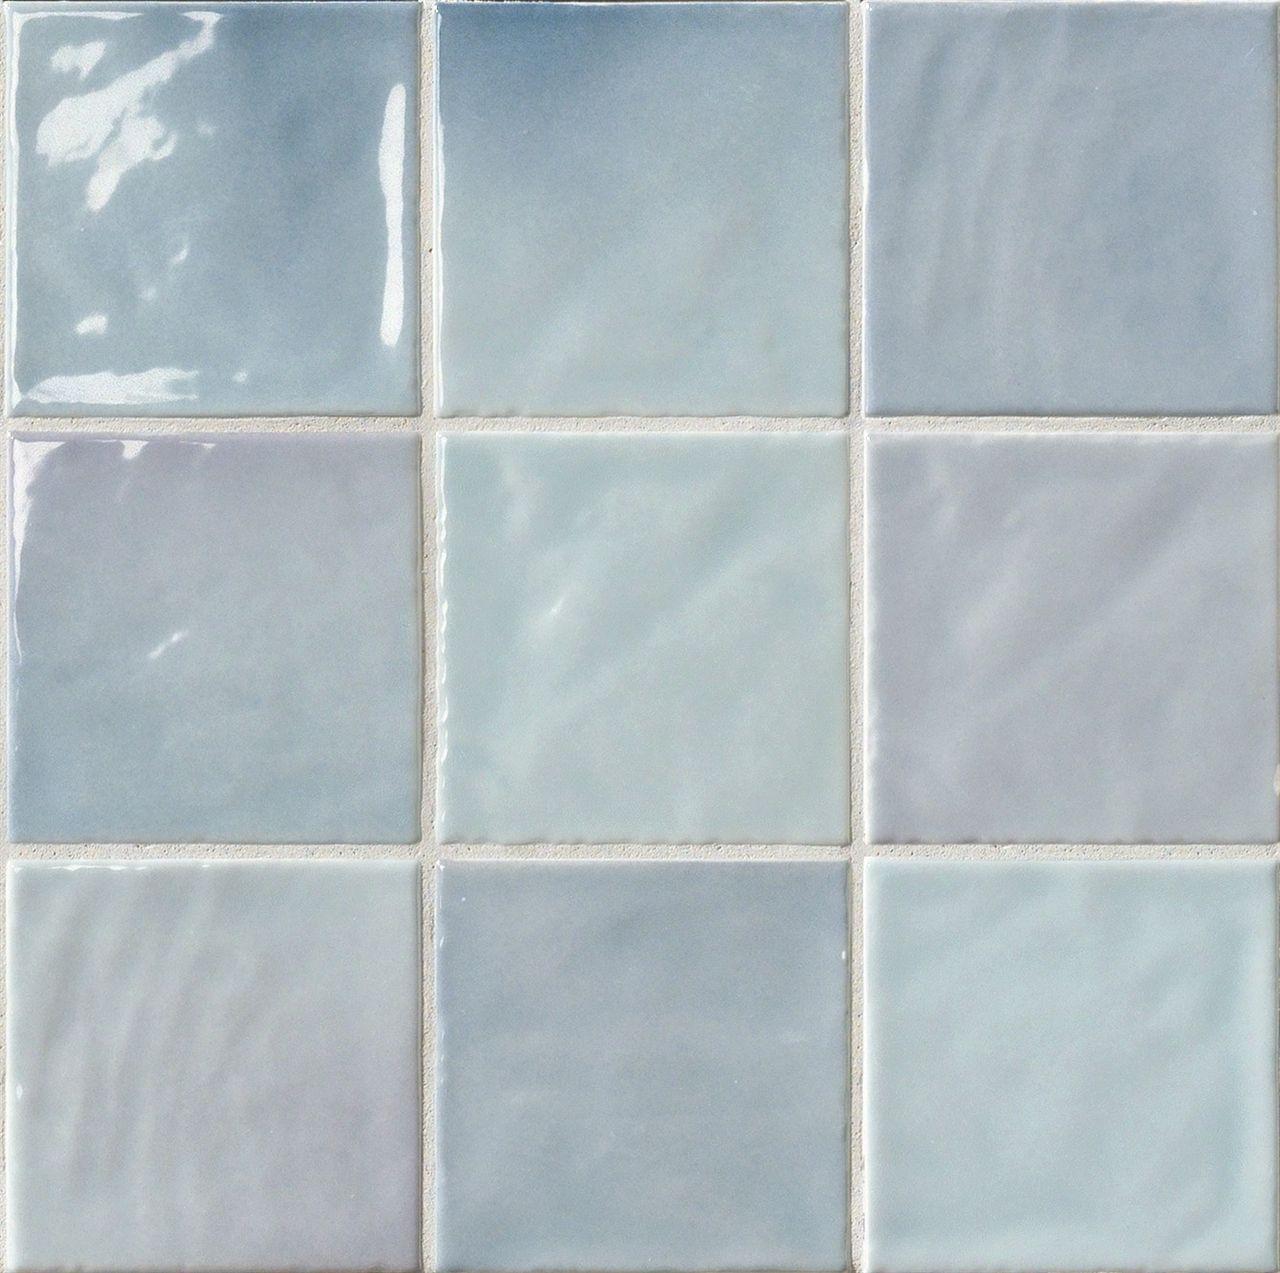 Napoli Wall Tile BLUE 100x100mm - Wall tiles and floor tiles - The ...